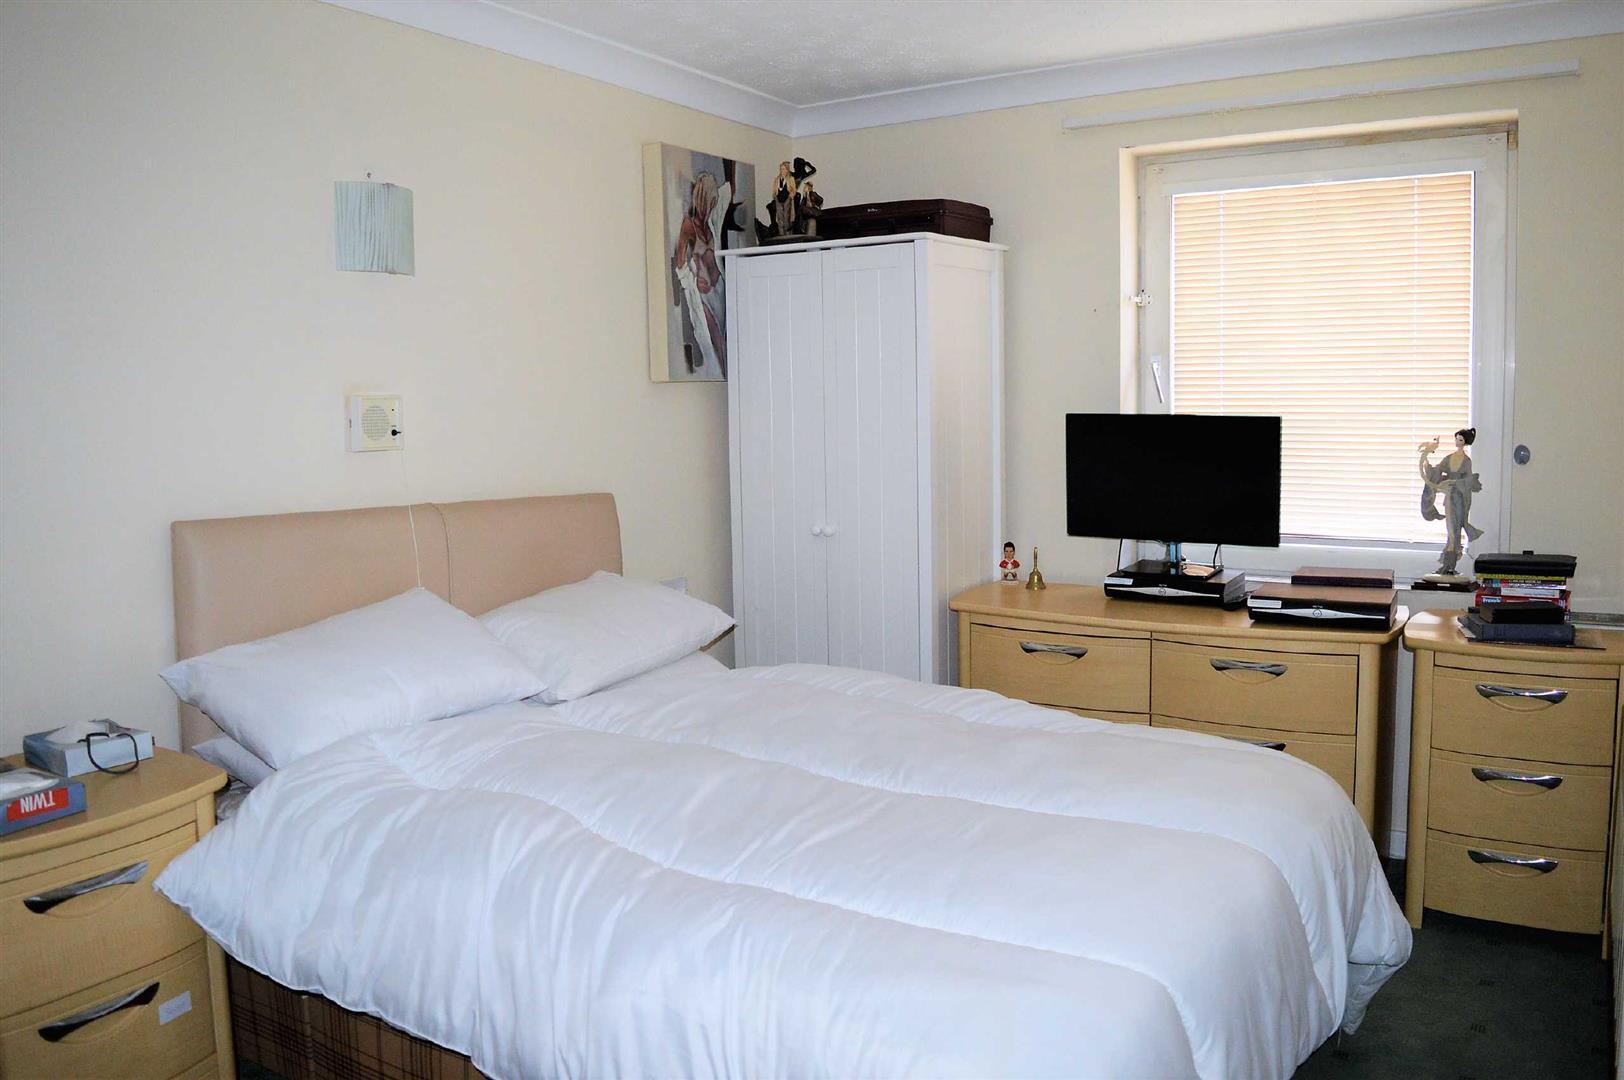 Homegower House, Swansea, SA1 4DL